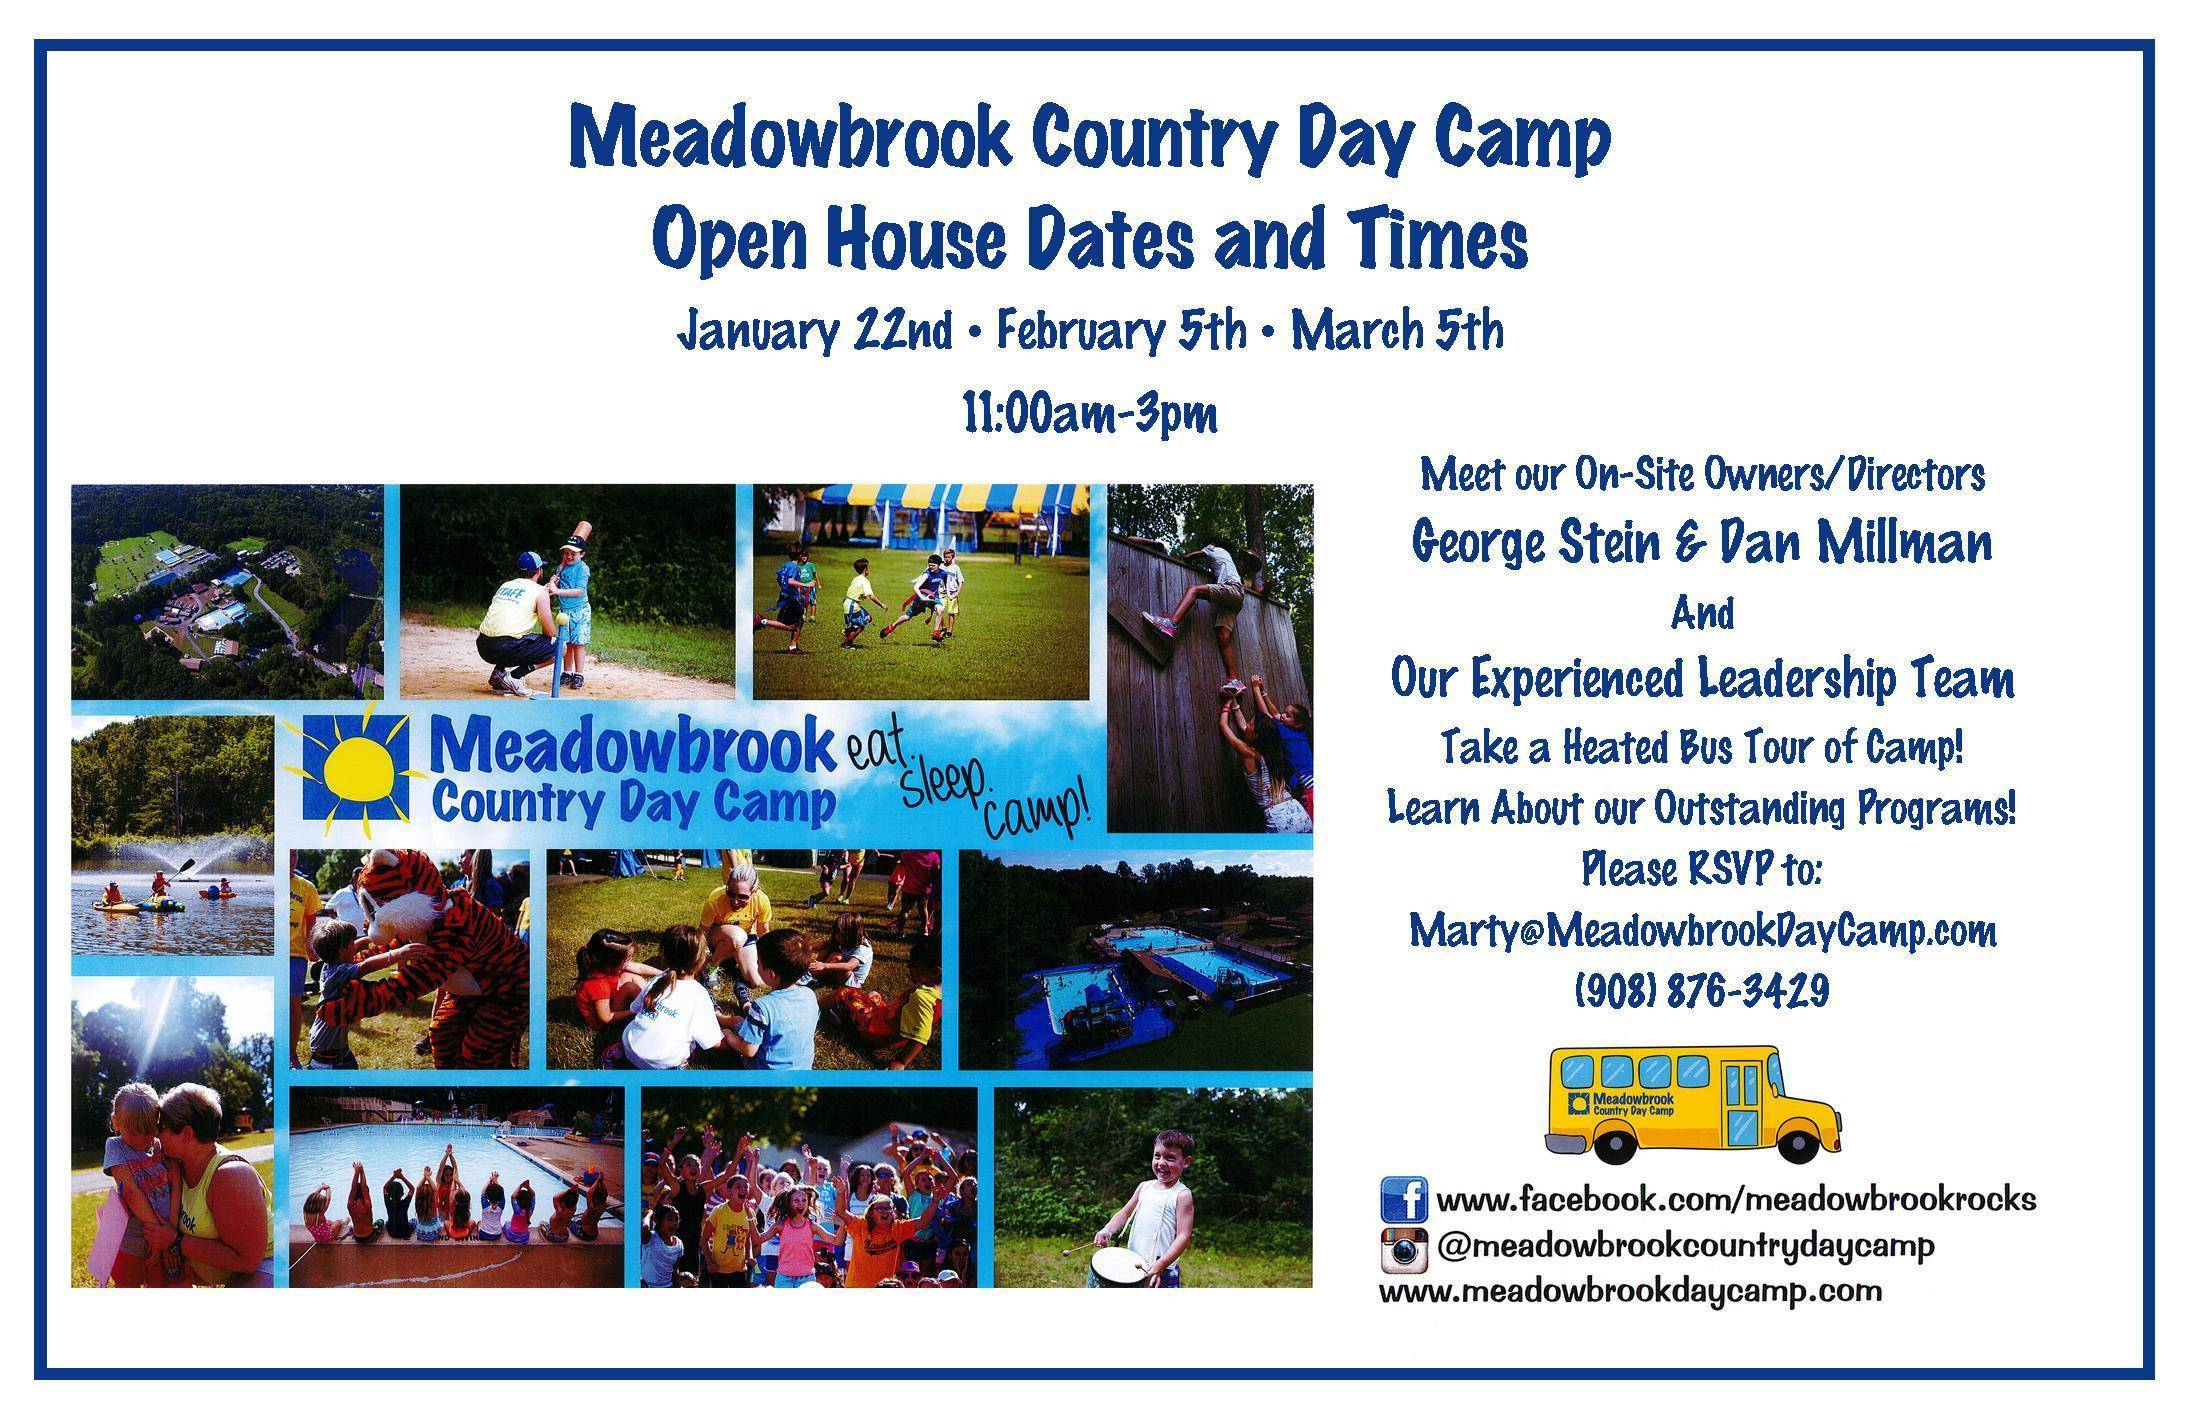 951ca88d3d3813ac72c3_Meadowbrook_Day_Camp.jpg